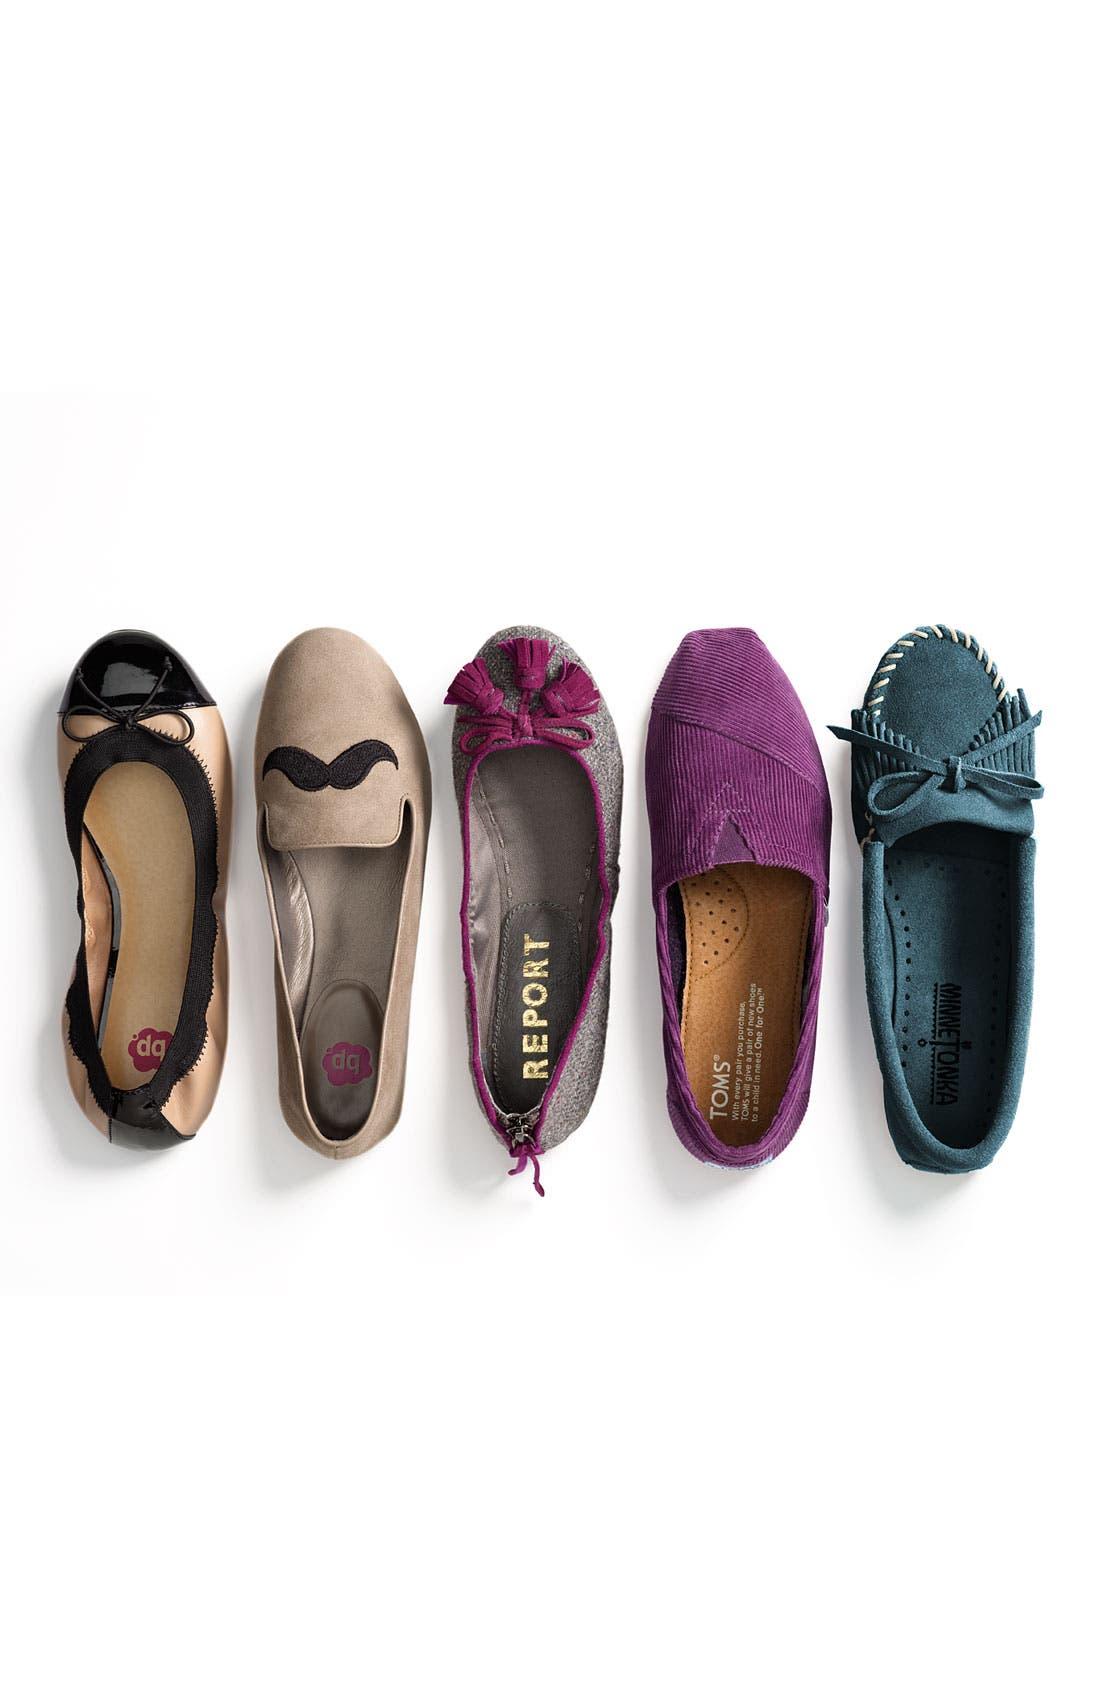 'Mindy' Ballet Flat,                             Main thumbnail 1, color,                             060